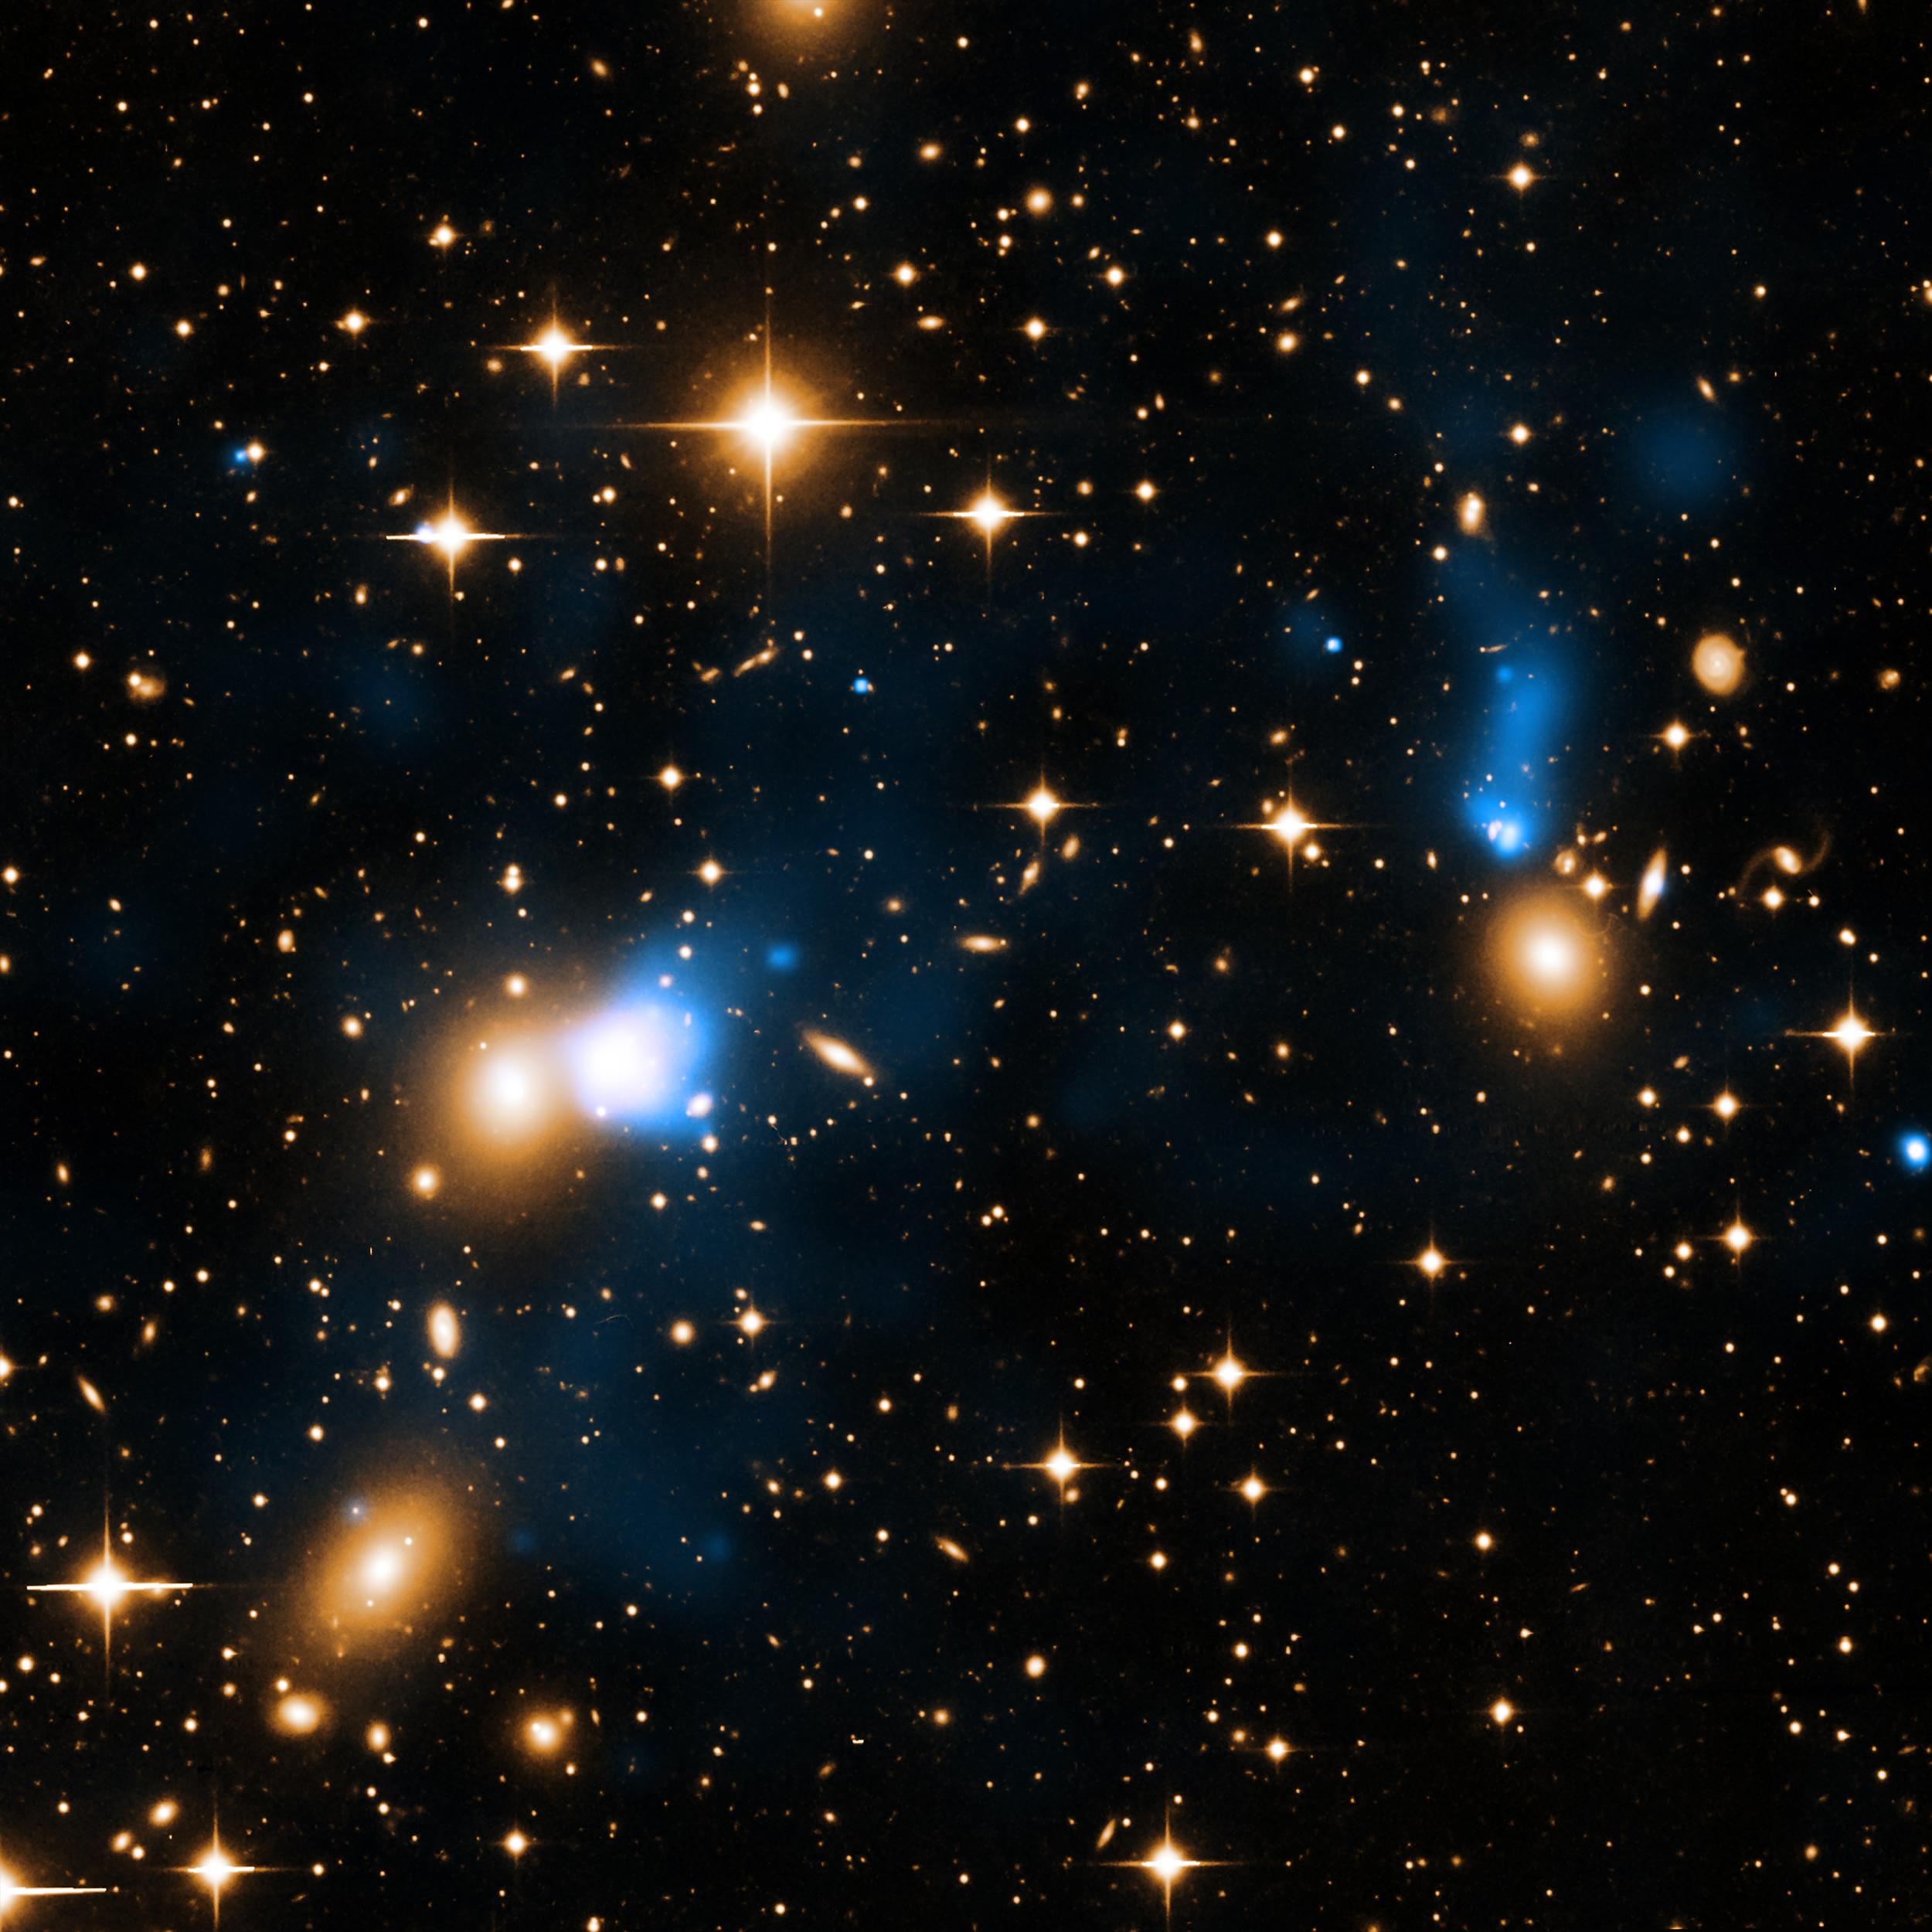 Image credit: X-ray: NASA/CXC/University of Bonn/G. Schellenberger et al; Optical: INT